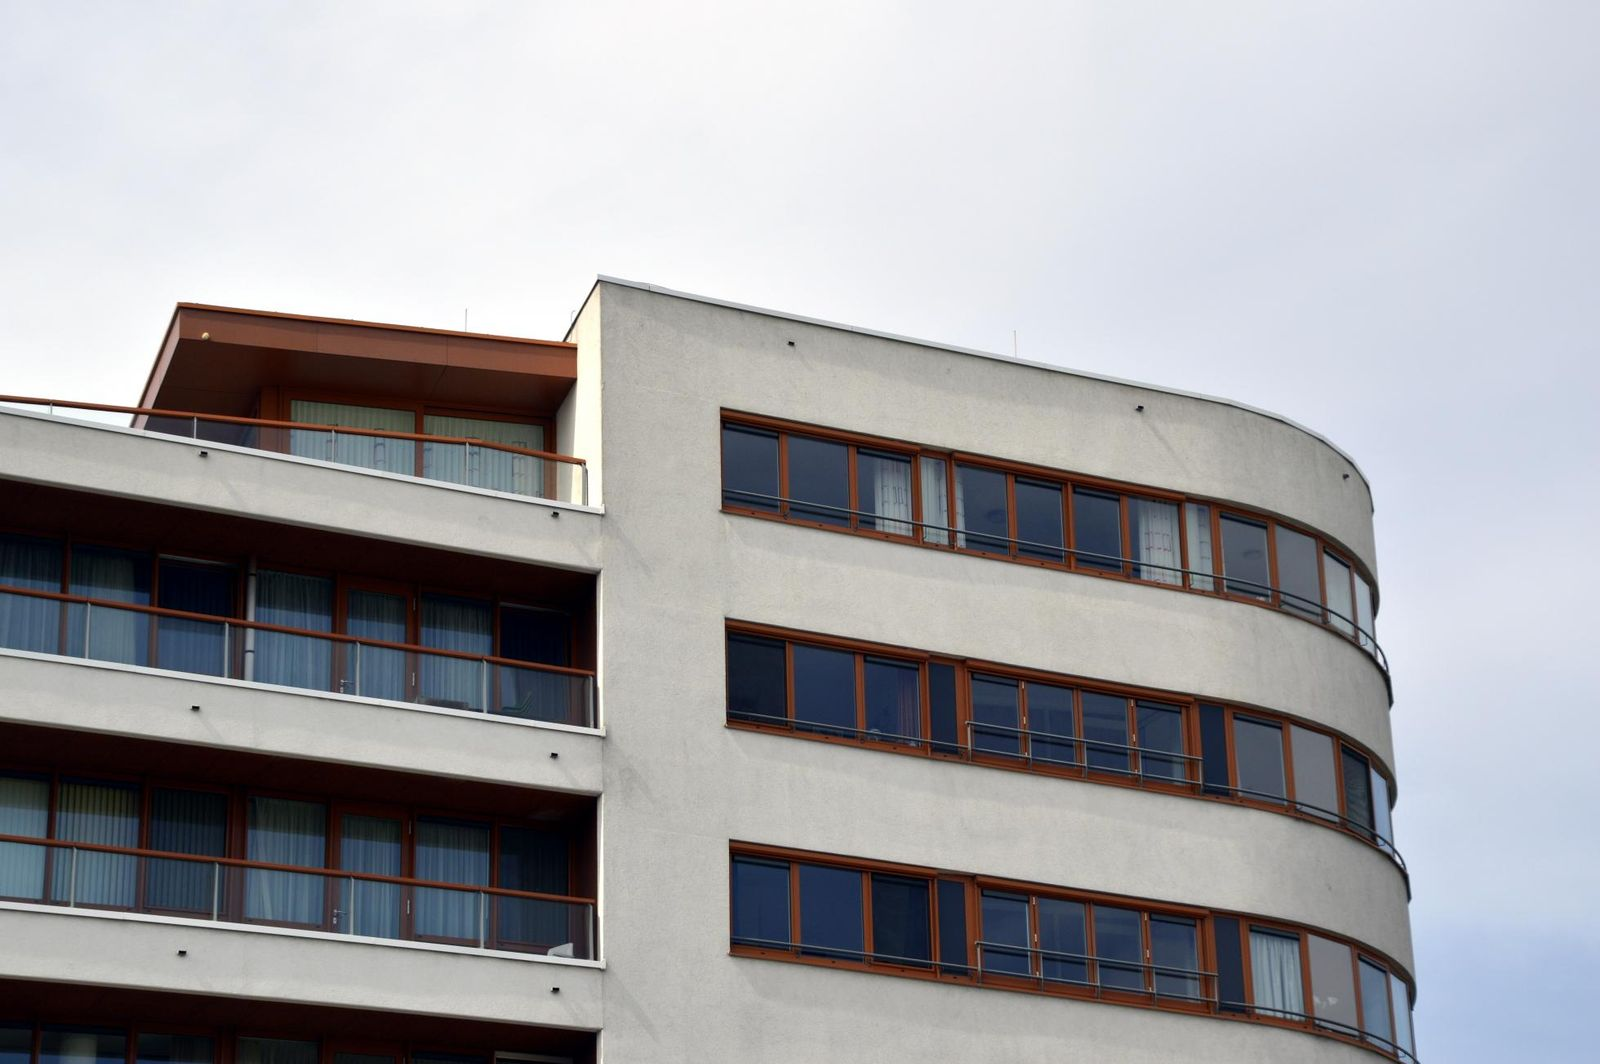 Strandwal 36, Vlissingen